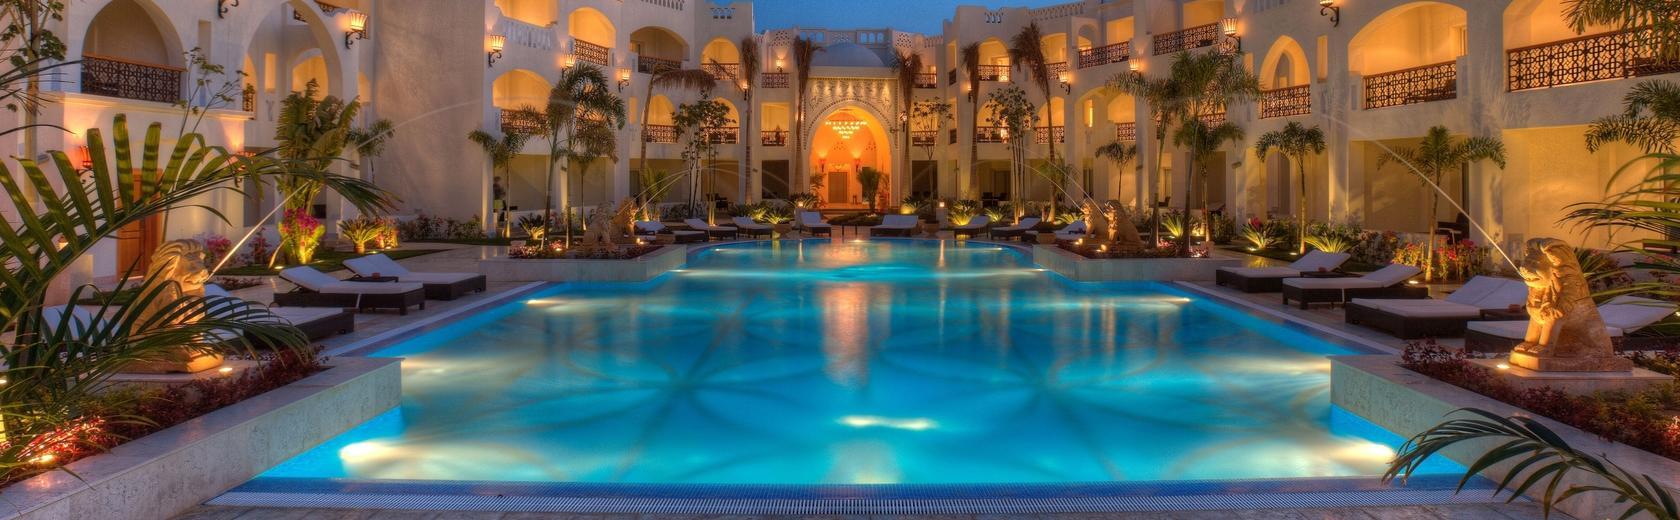 Le Royale Sonesta Collection Luxury Resort image8